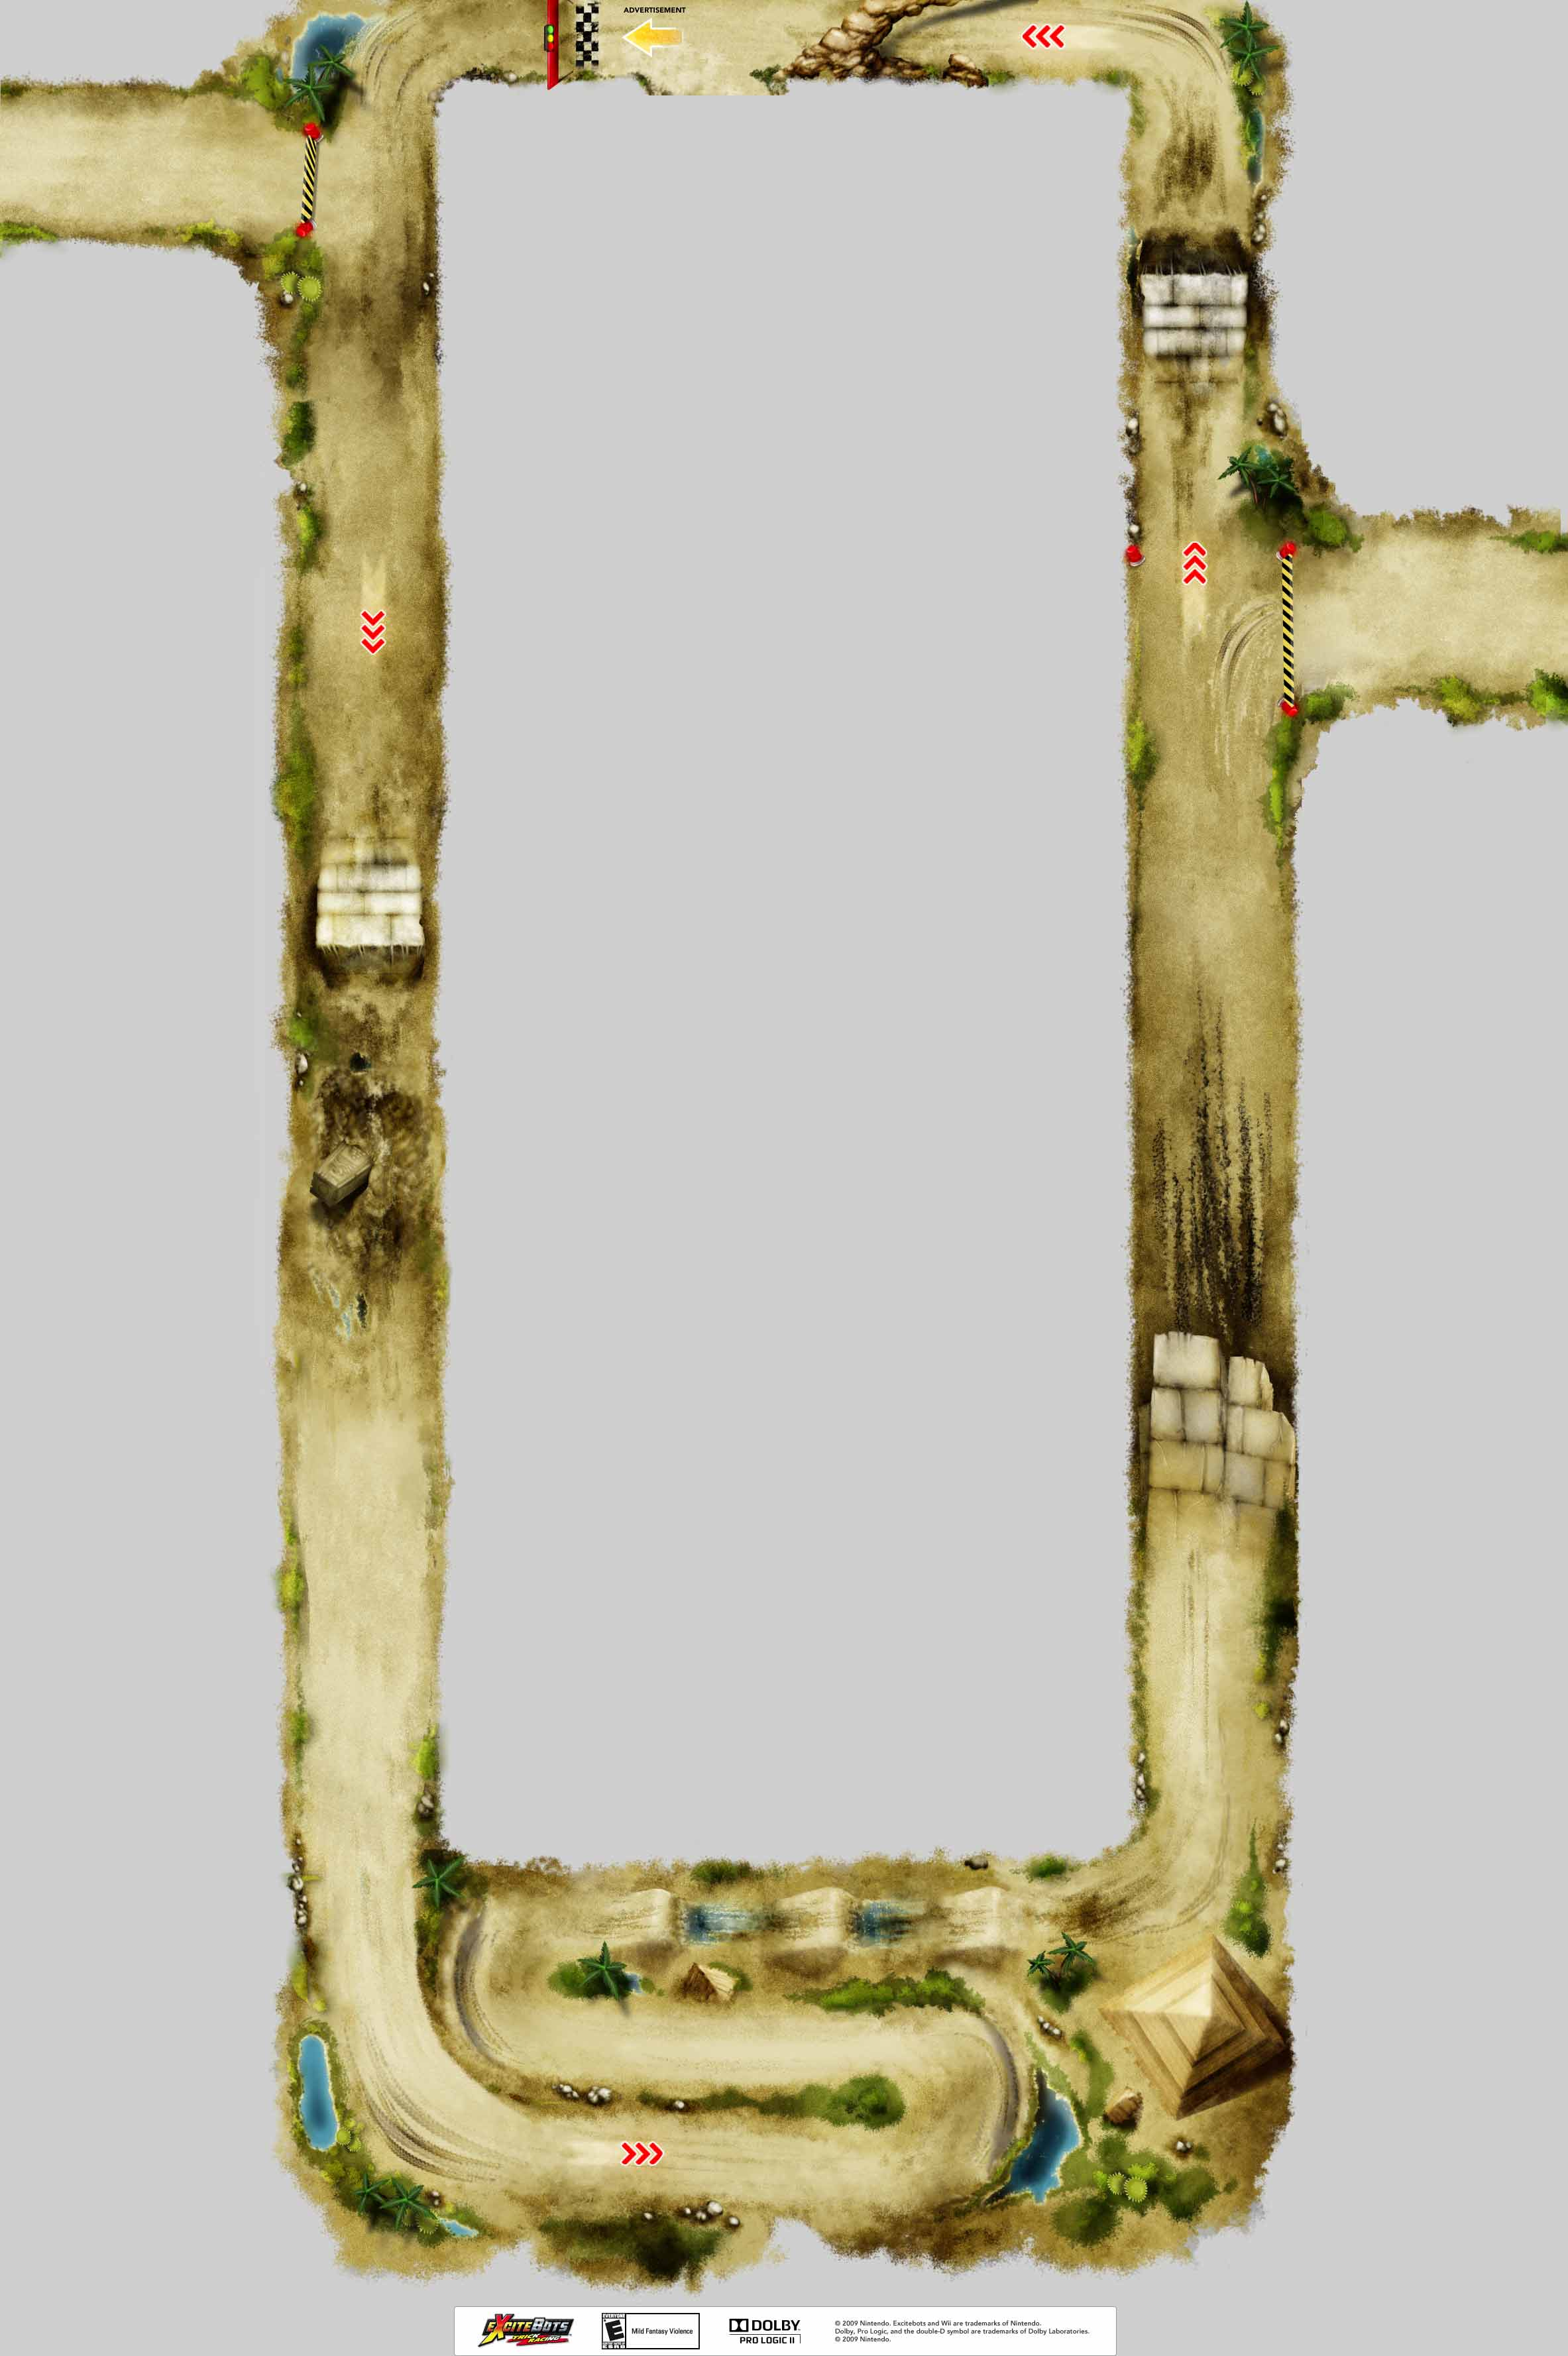 https://images.neopets.com/games/excitebots/desert_track_flat.jpg